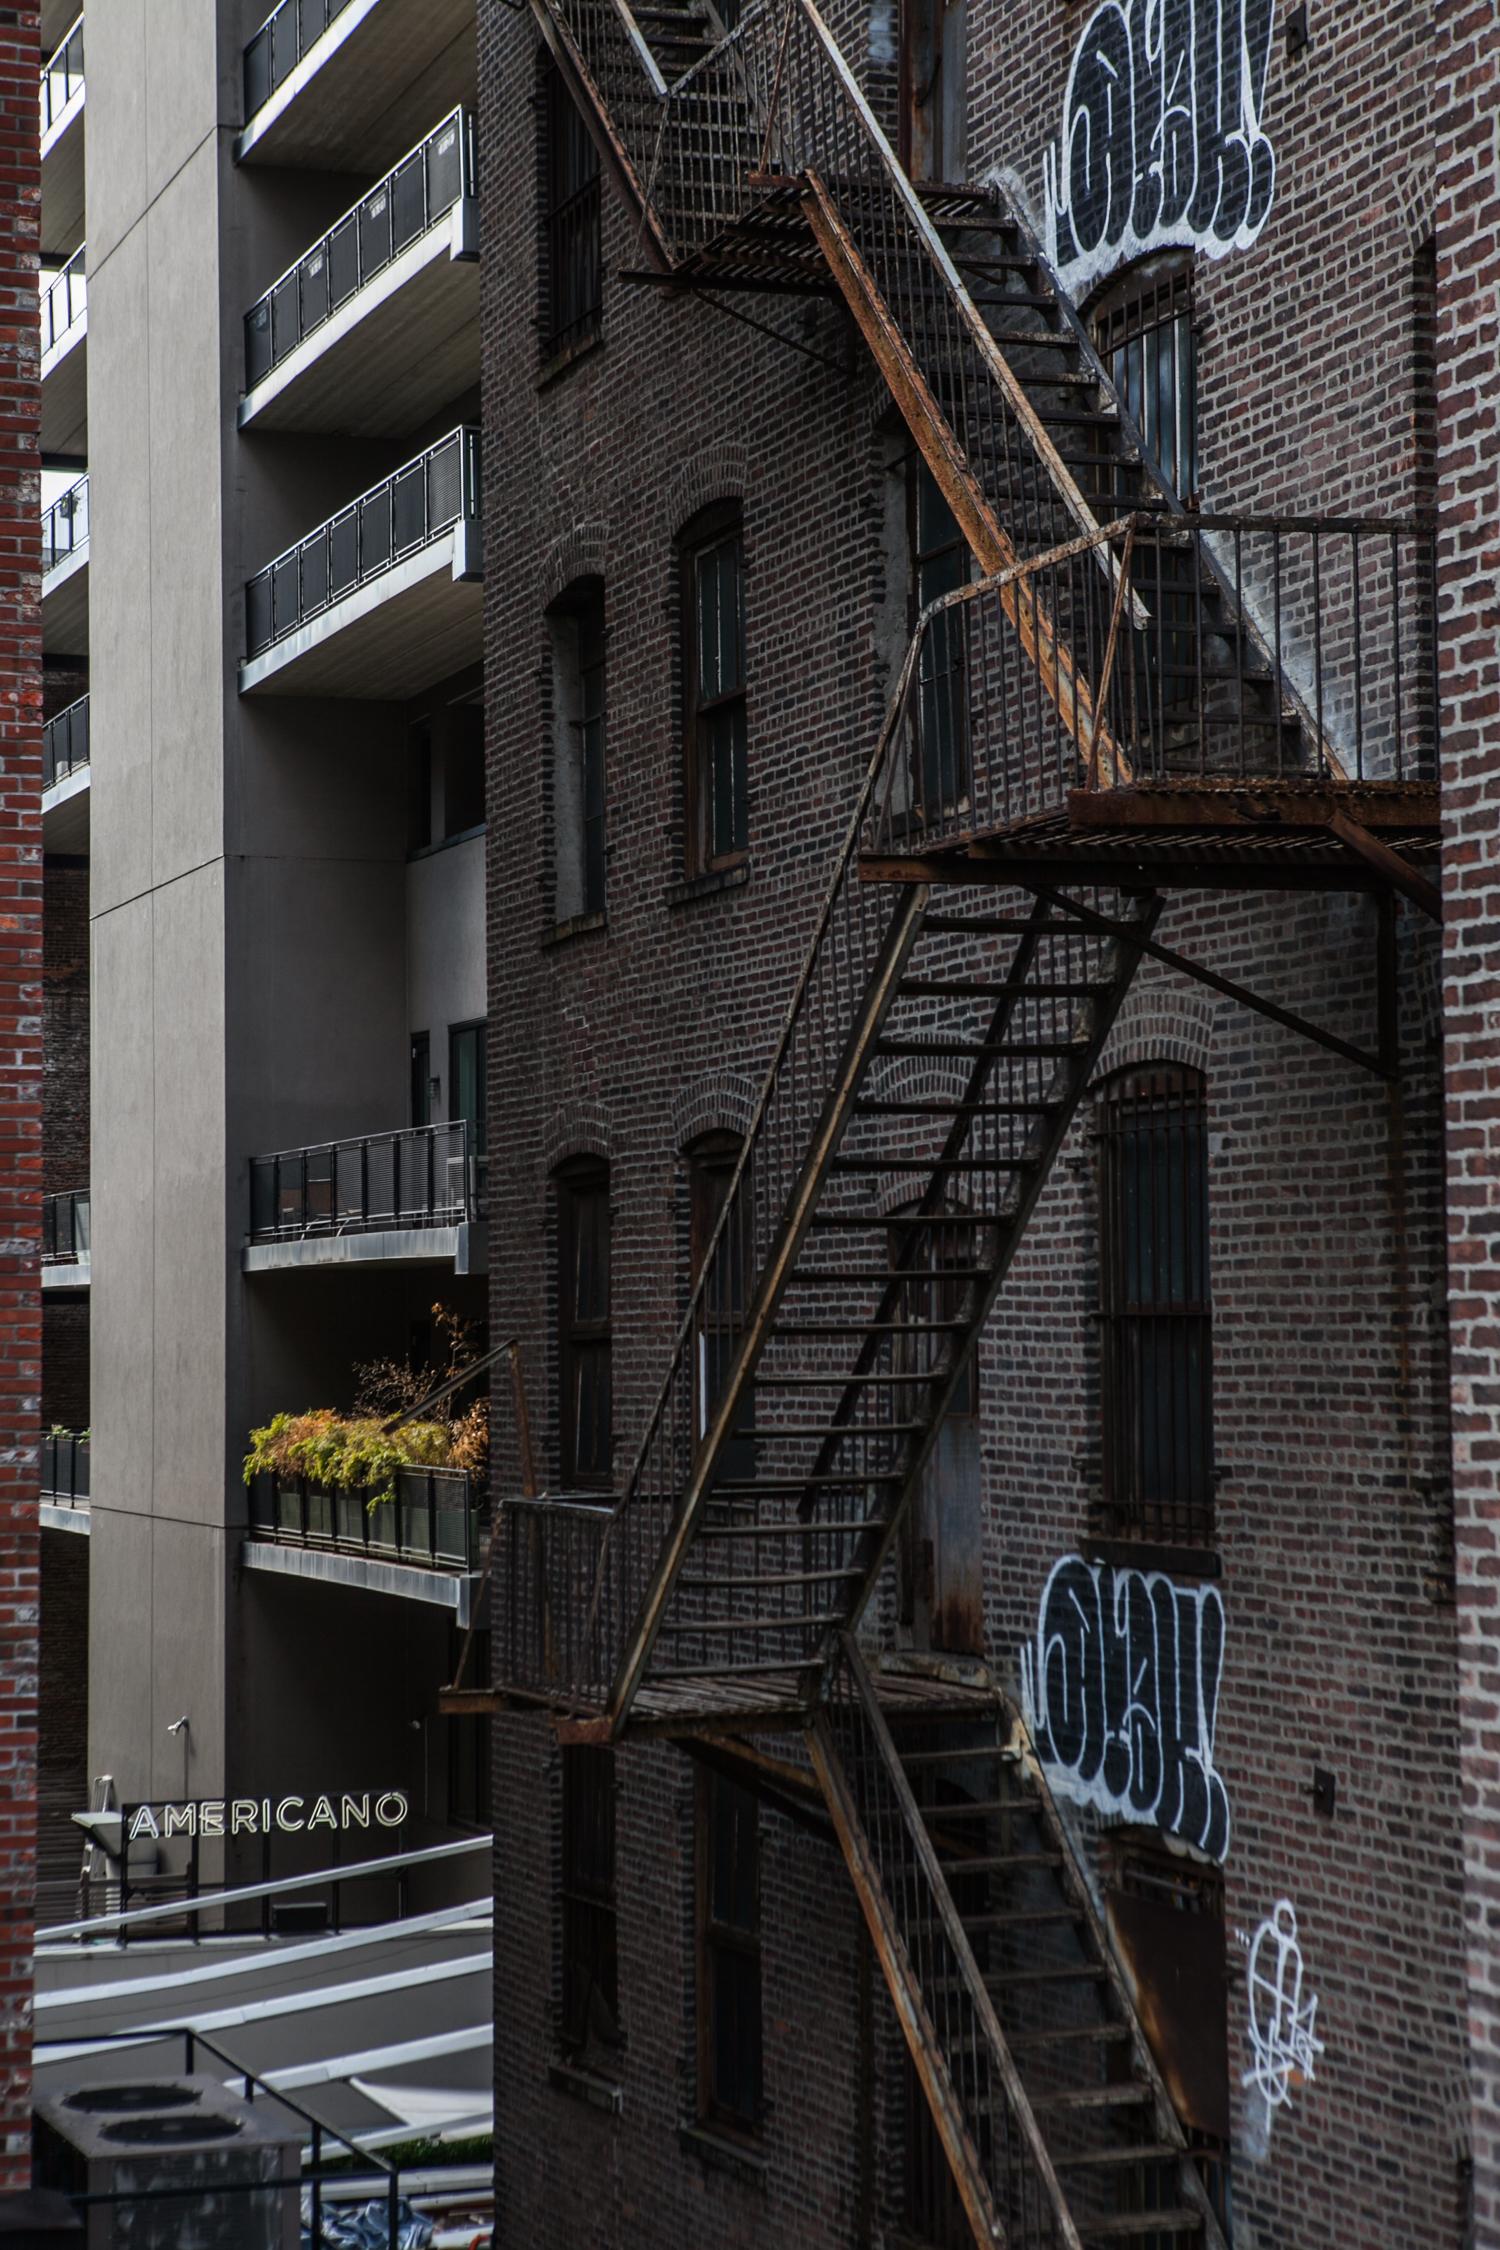 NYC_2013-06-08_7316.jpg